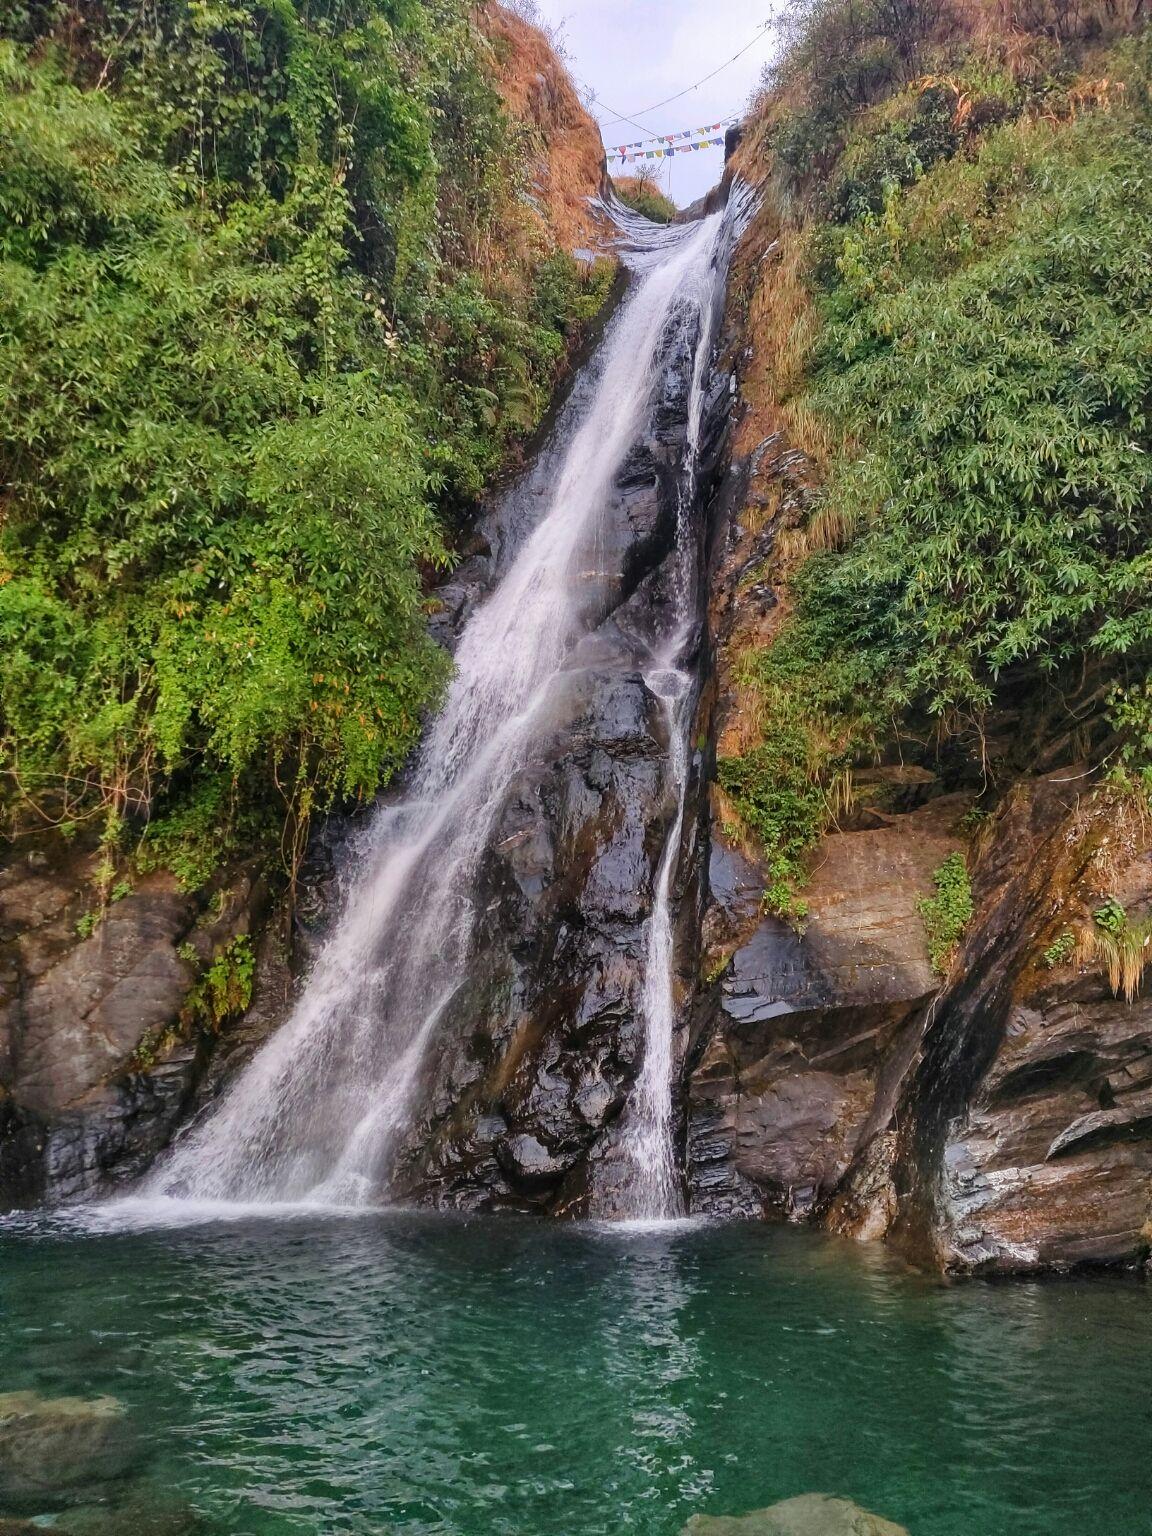 Photo of Bhagsunag Waterfall By Ammy Clickz